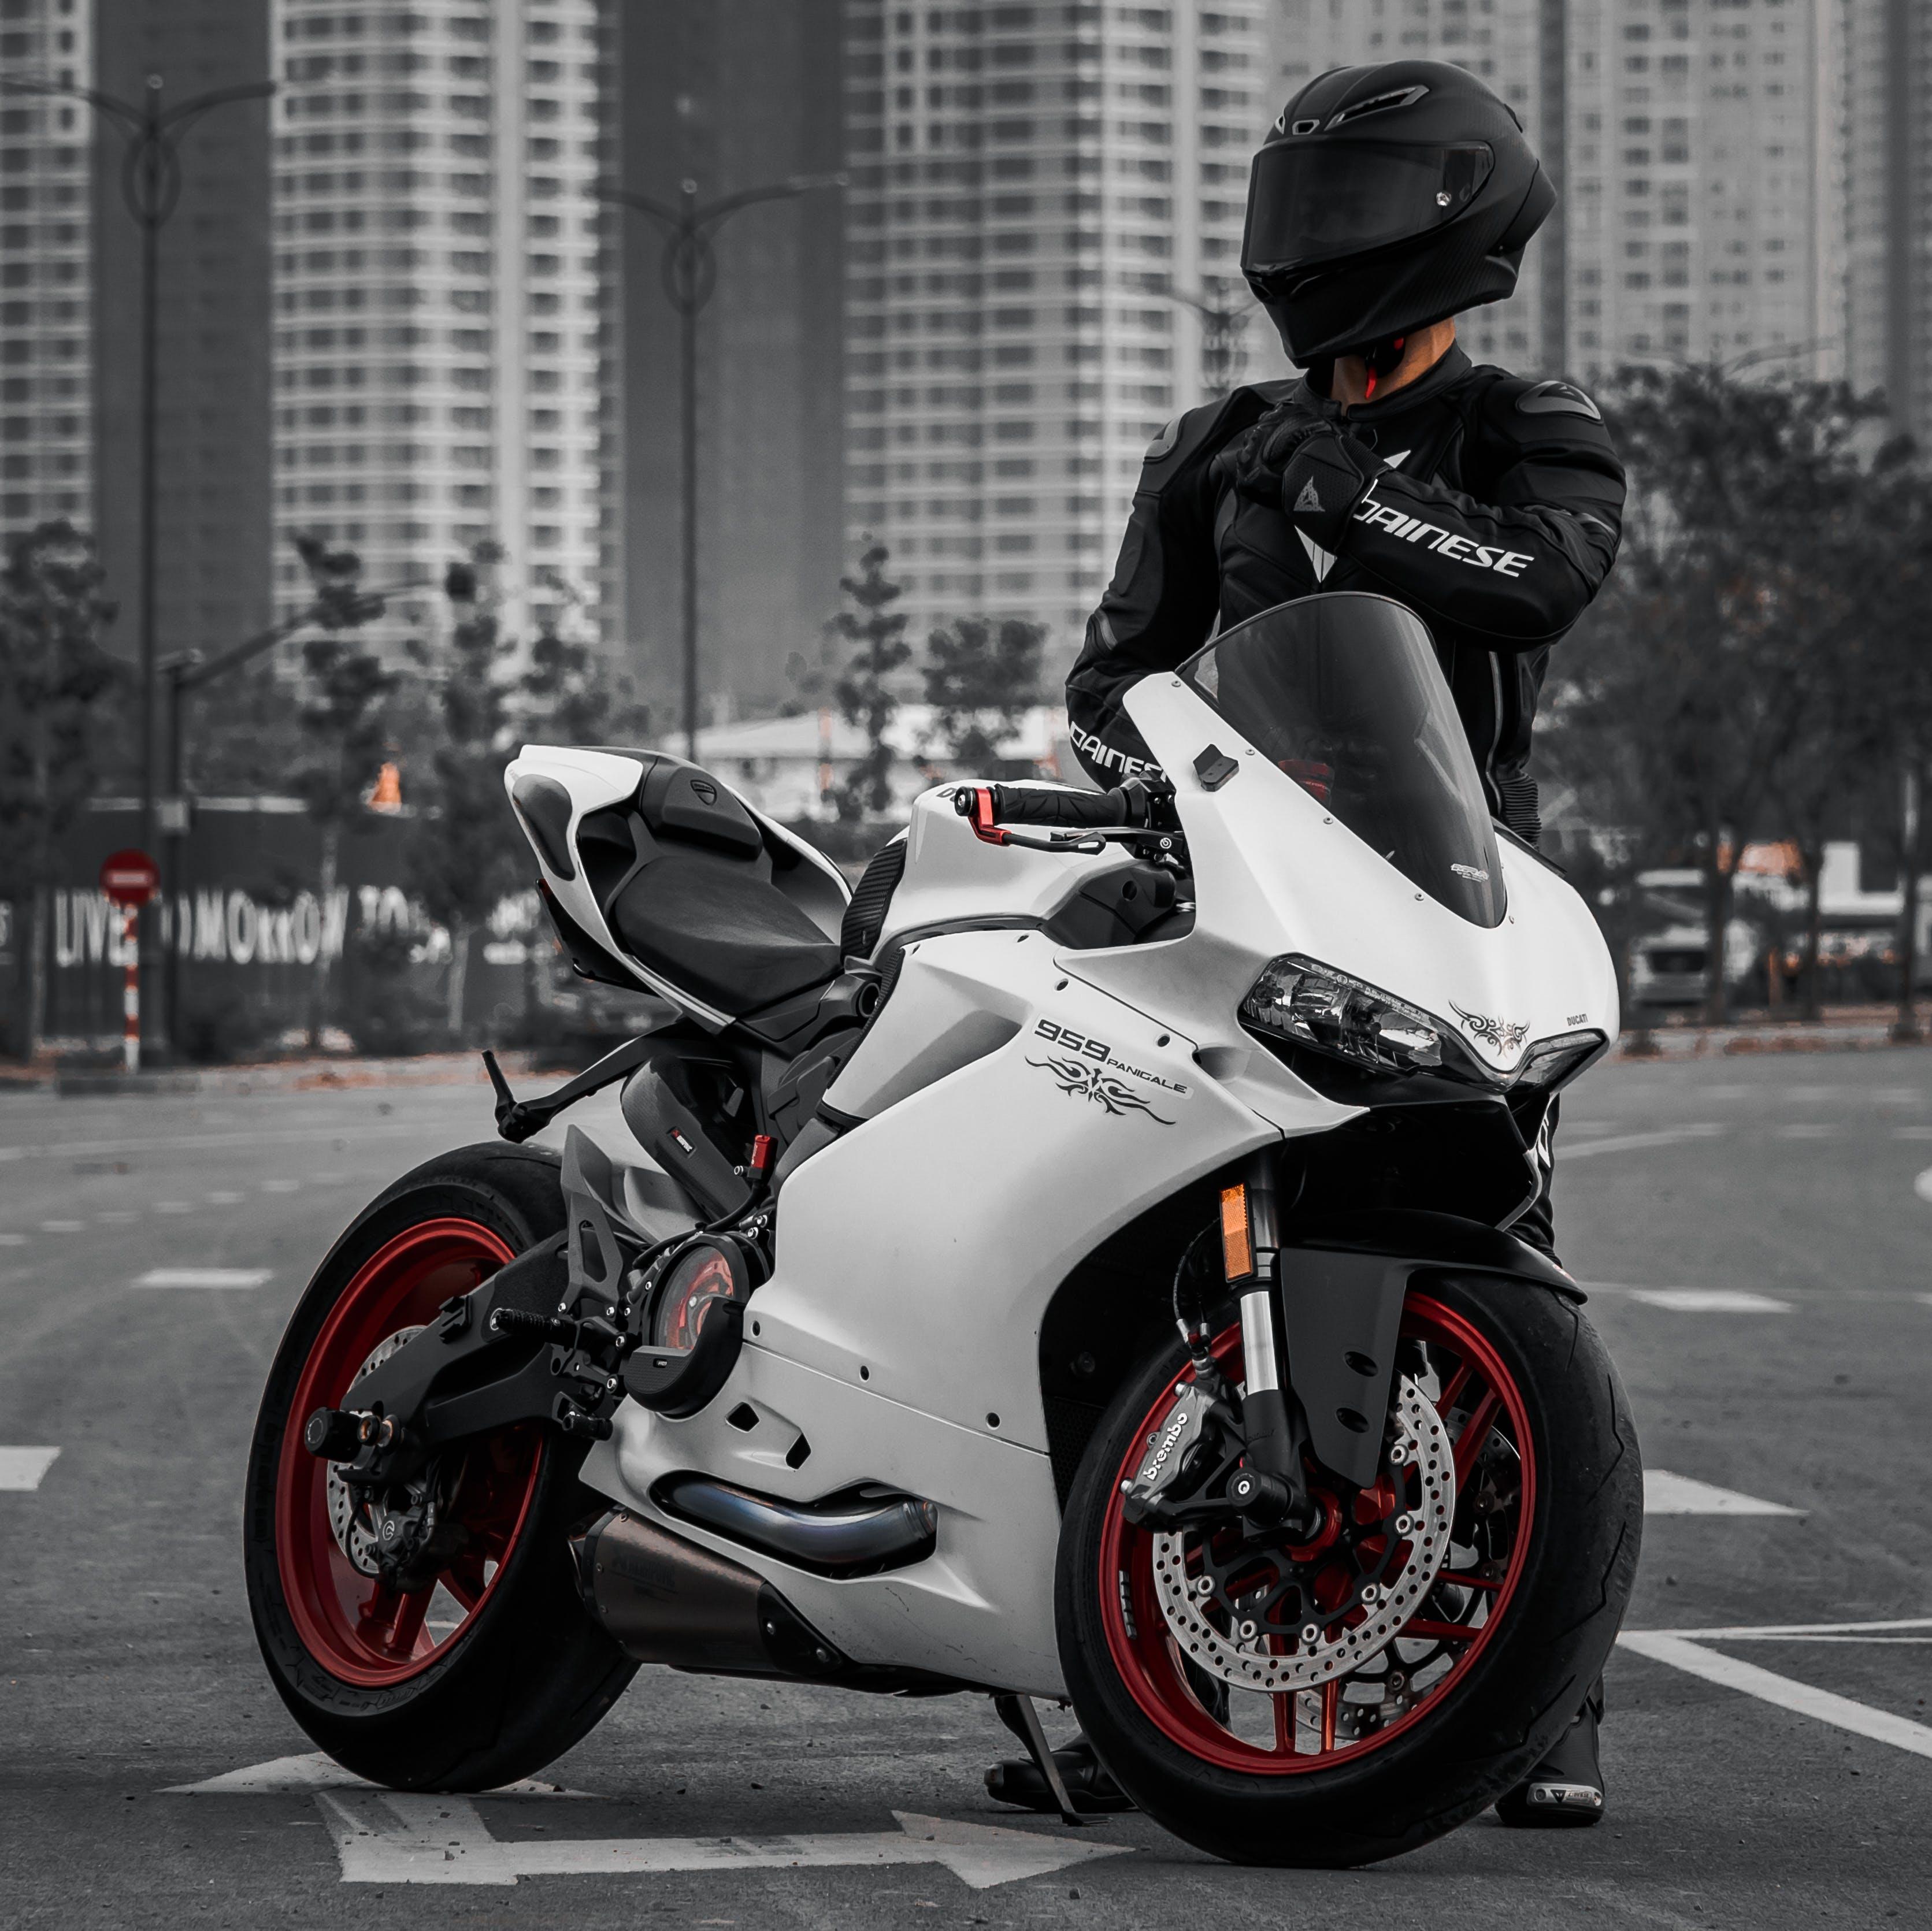 Man in Black Jacket Riding White Sports Bike